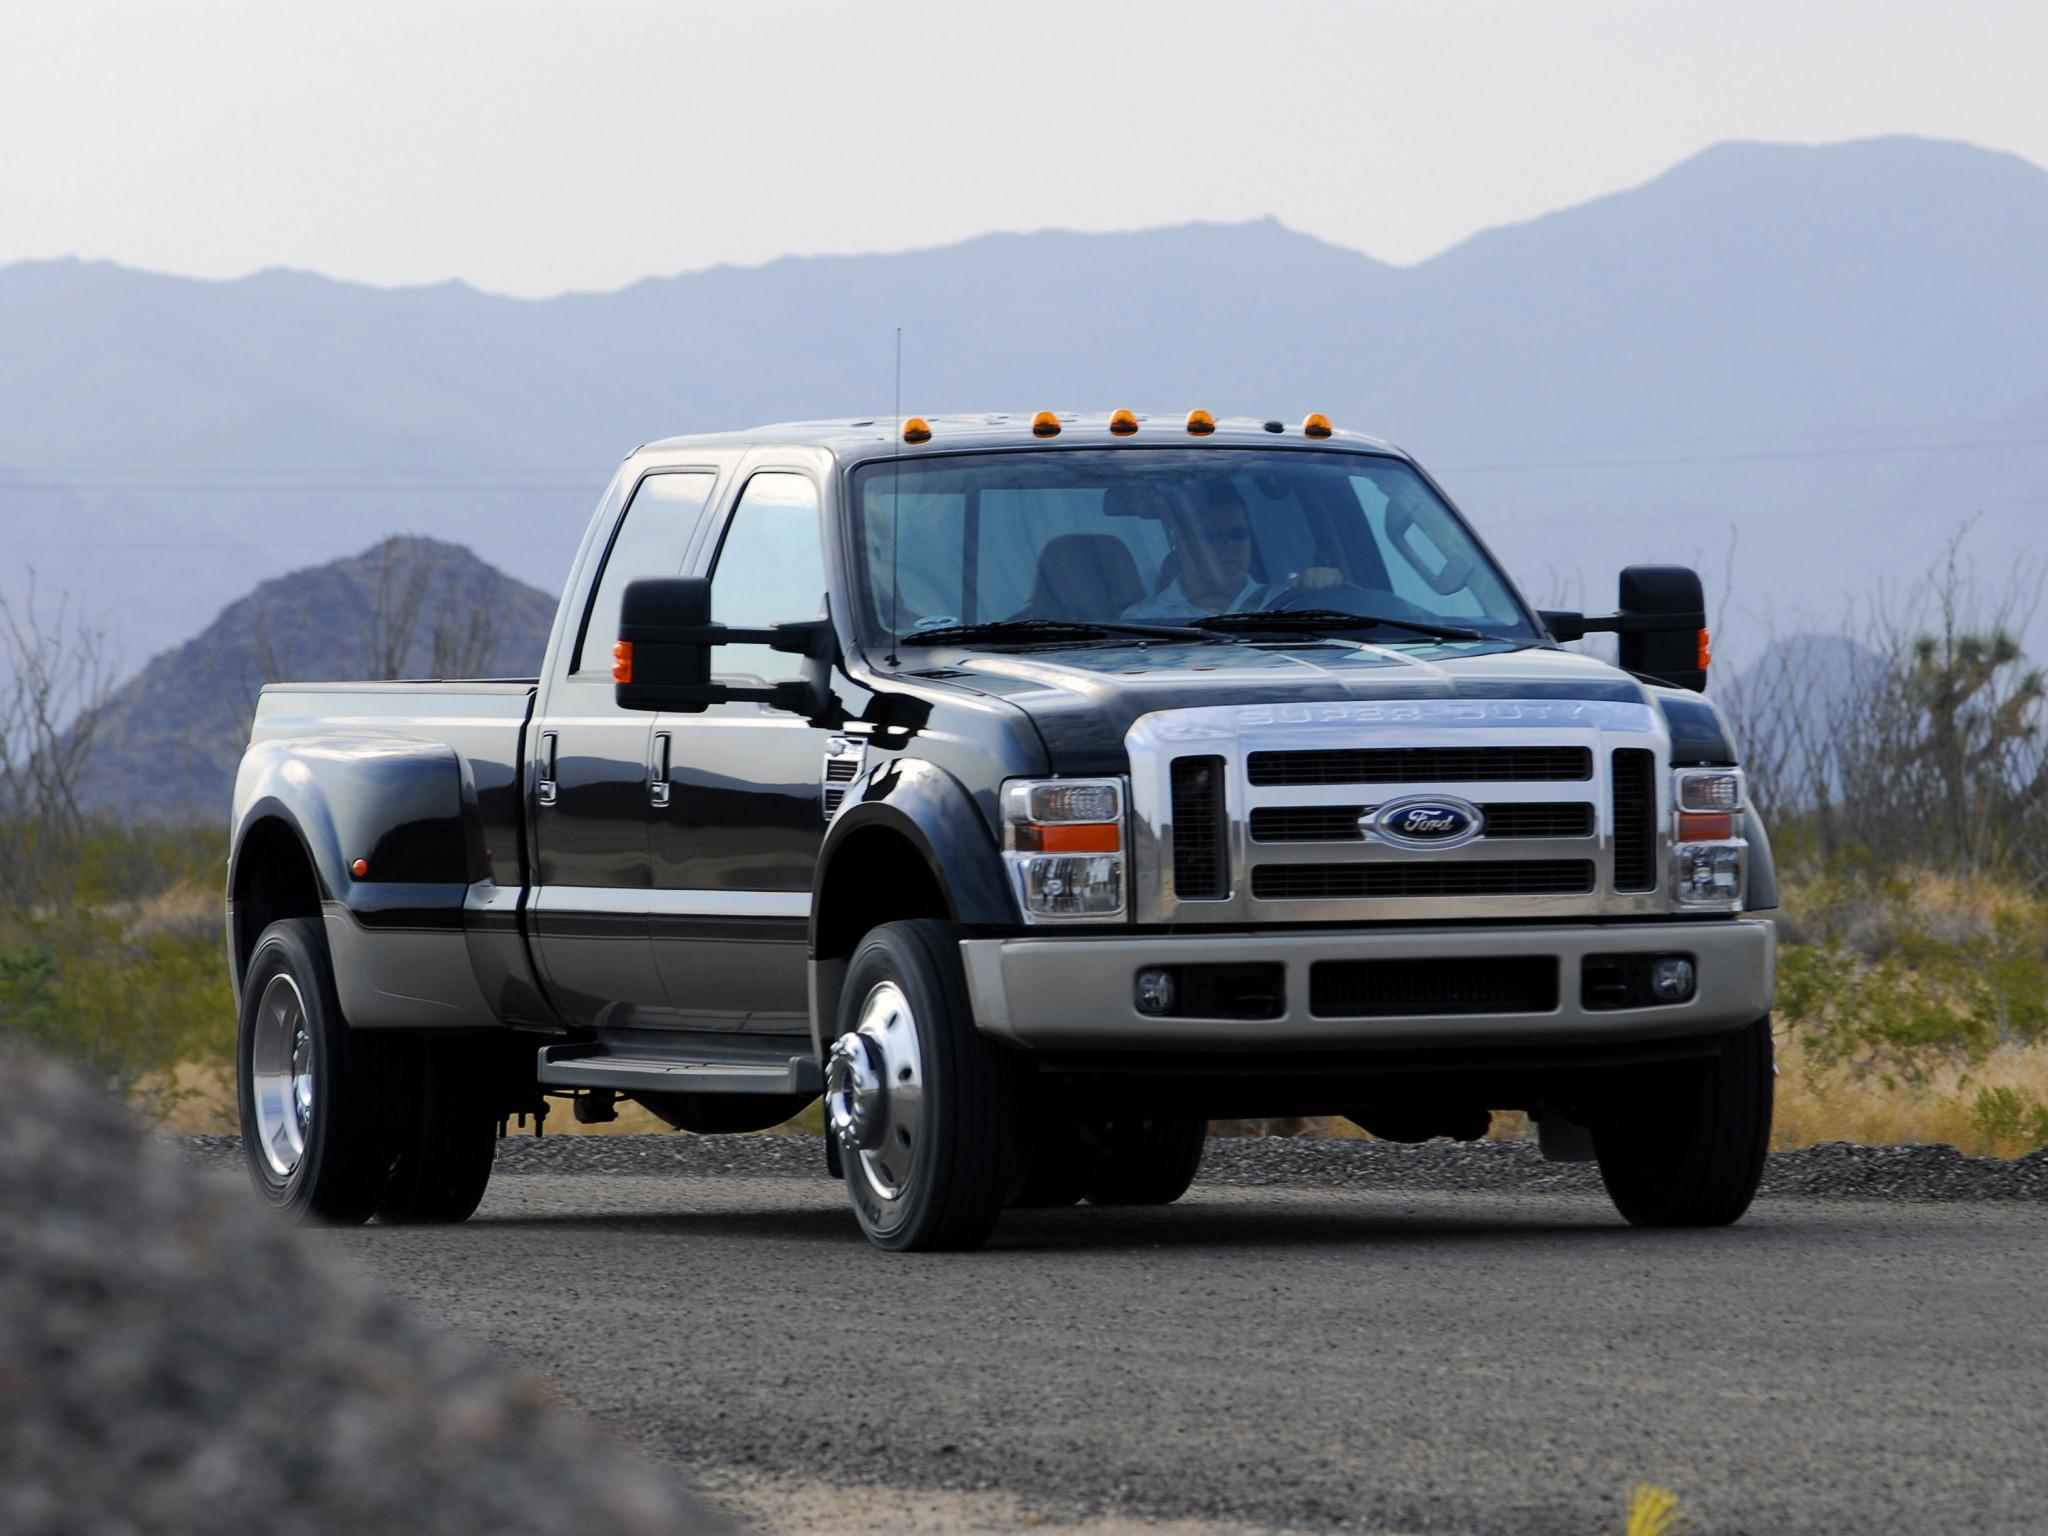 2008 ford f 450 superduty truck 4x4 f wallpaper 2048x1536 108540 wallpaperup. Black Bedroom Furniture Sets. Home Design Ideas